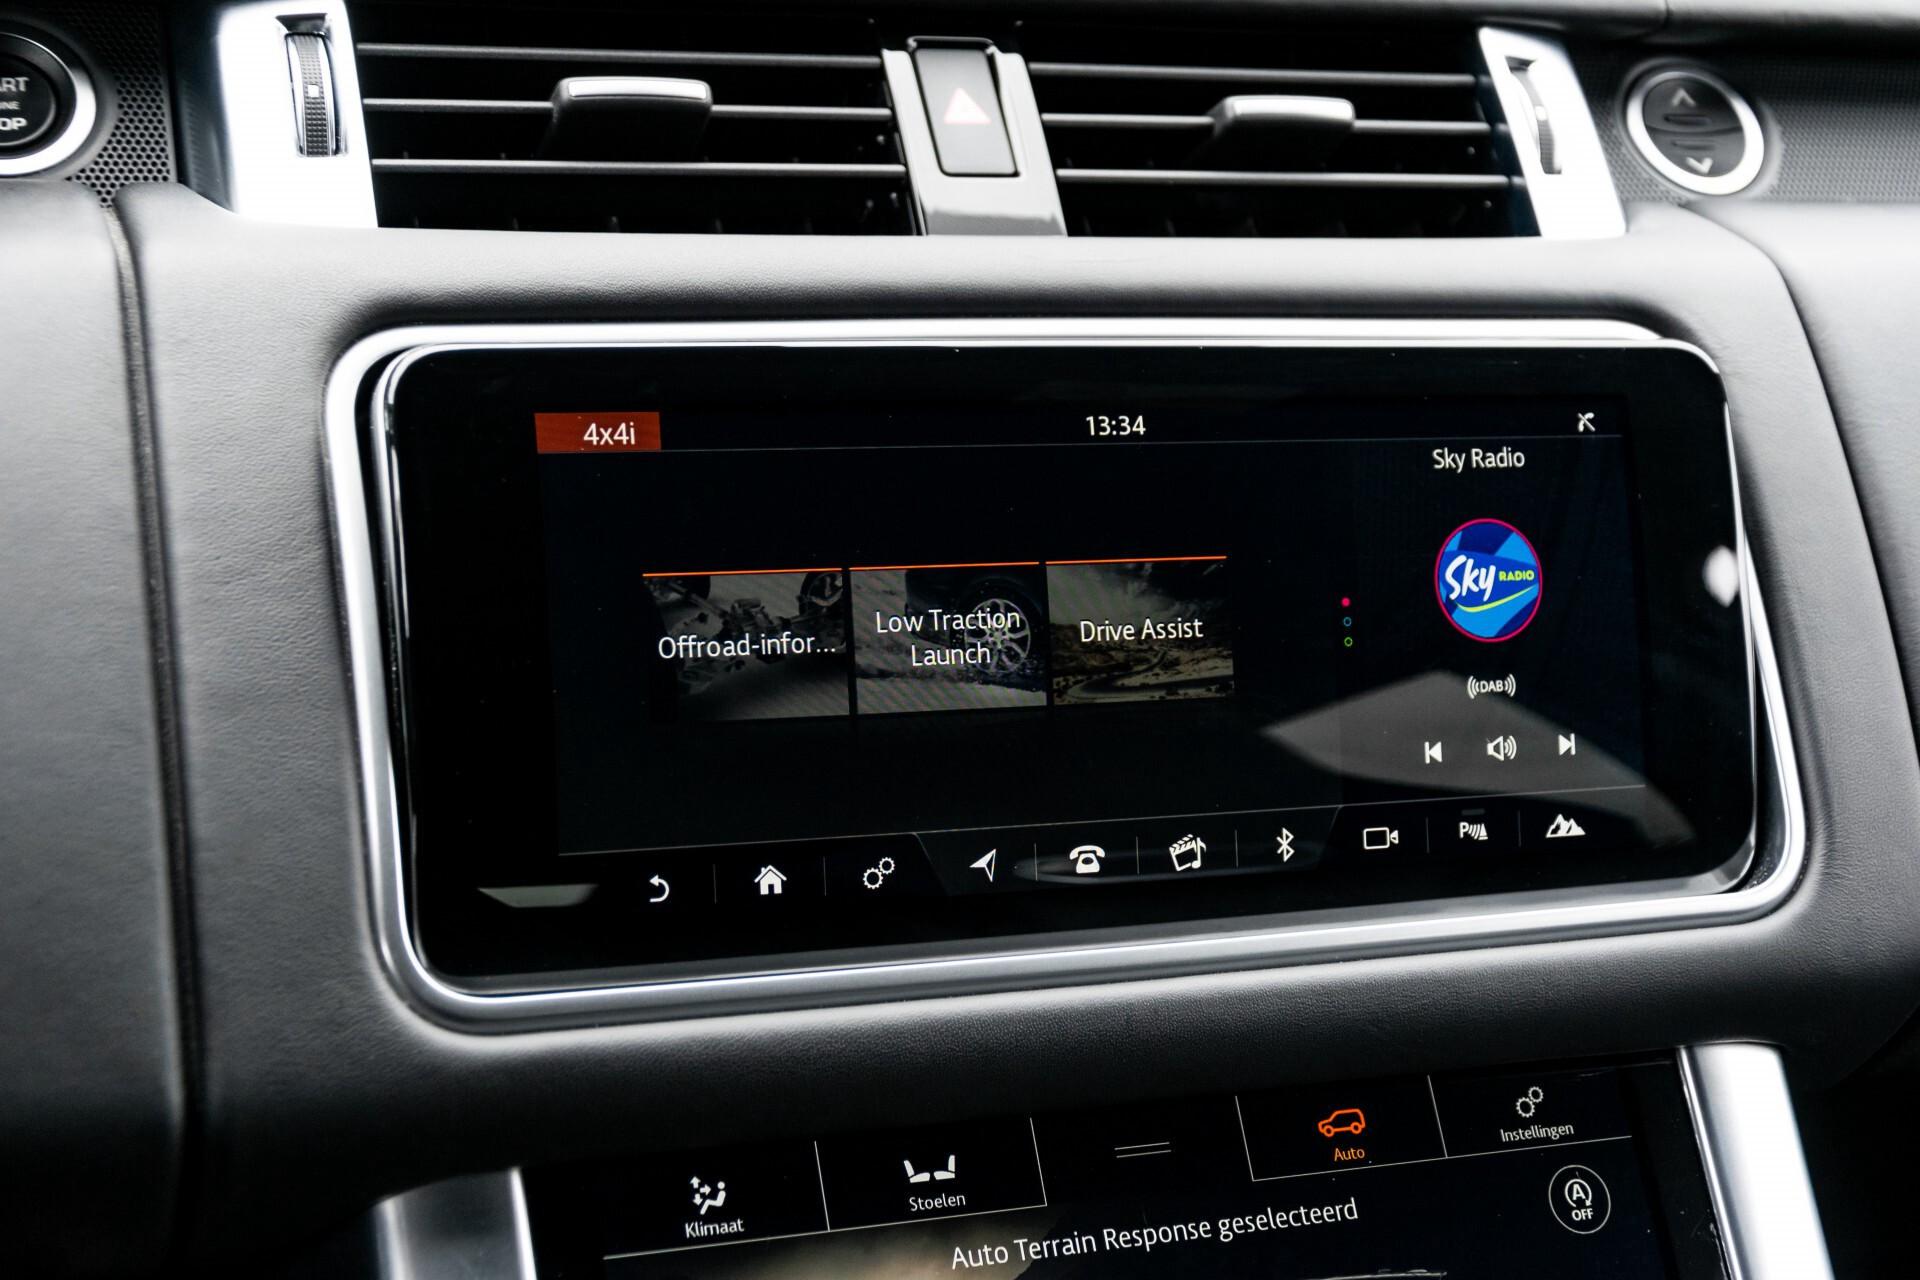 Land Rover Range Rover Sport SVR 5.0 Supercharged 575pk Full Carbon Nieuwprijs €241377 Foto 27